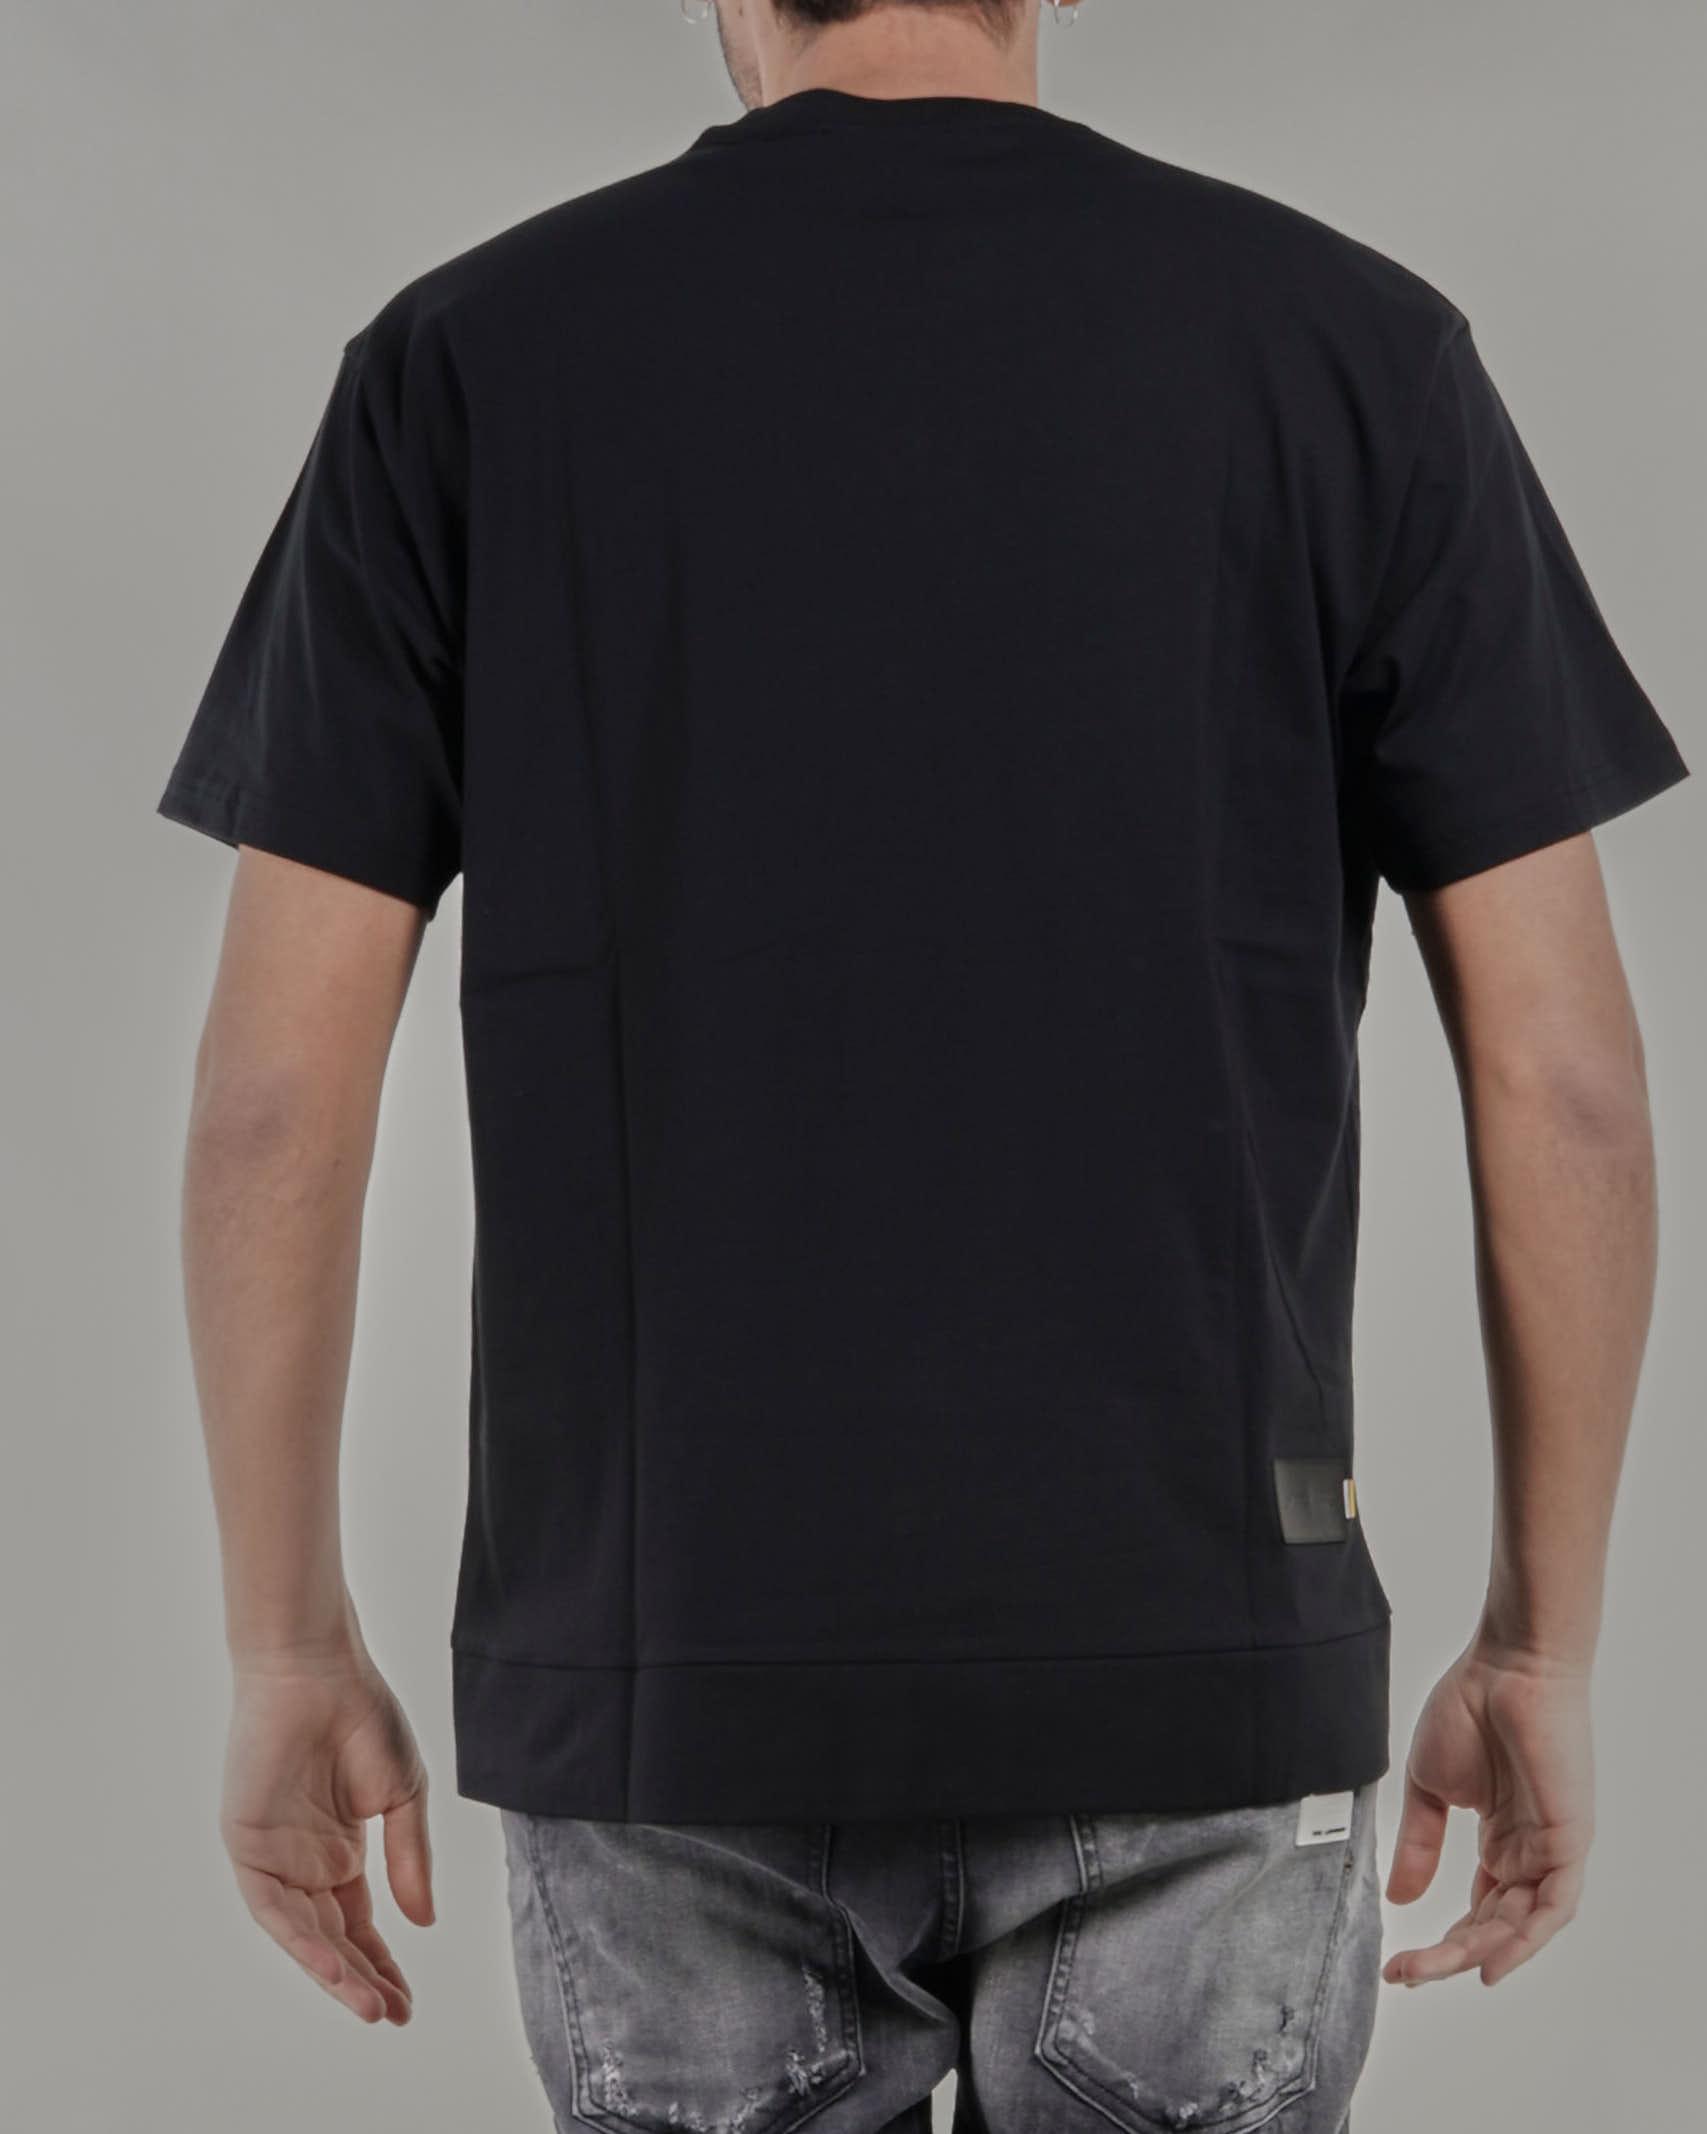 T-shirt con tasca e zip colorata sul davanti Low Brand LOW BRAND | T-shirt | L1TSS215690D001